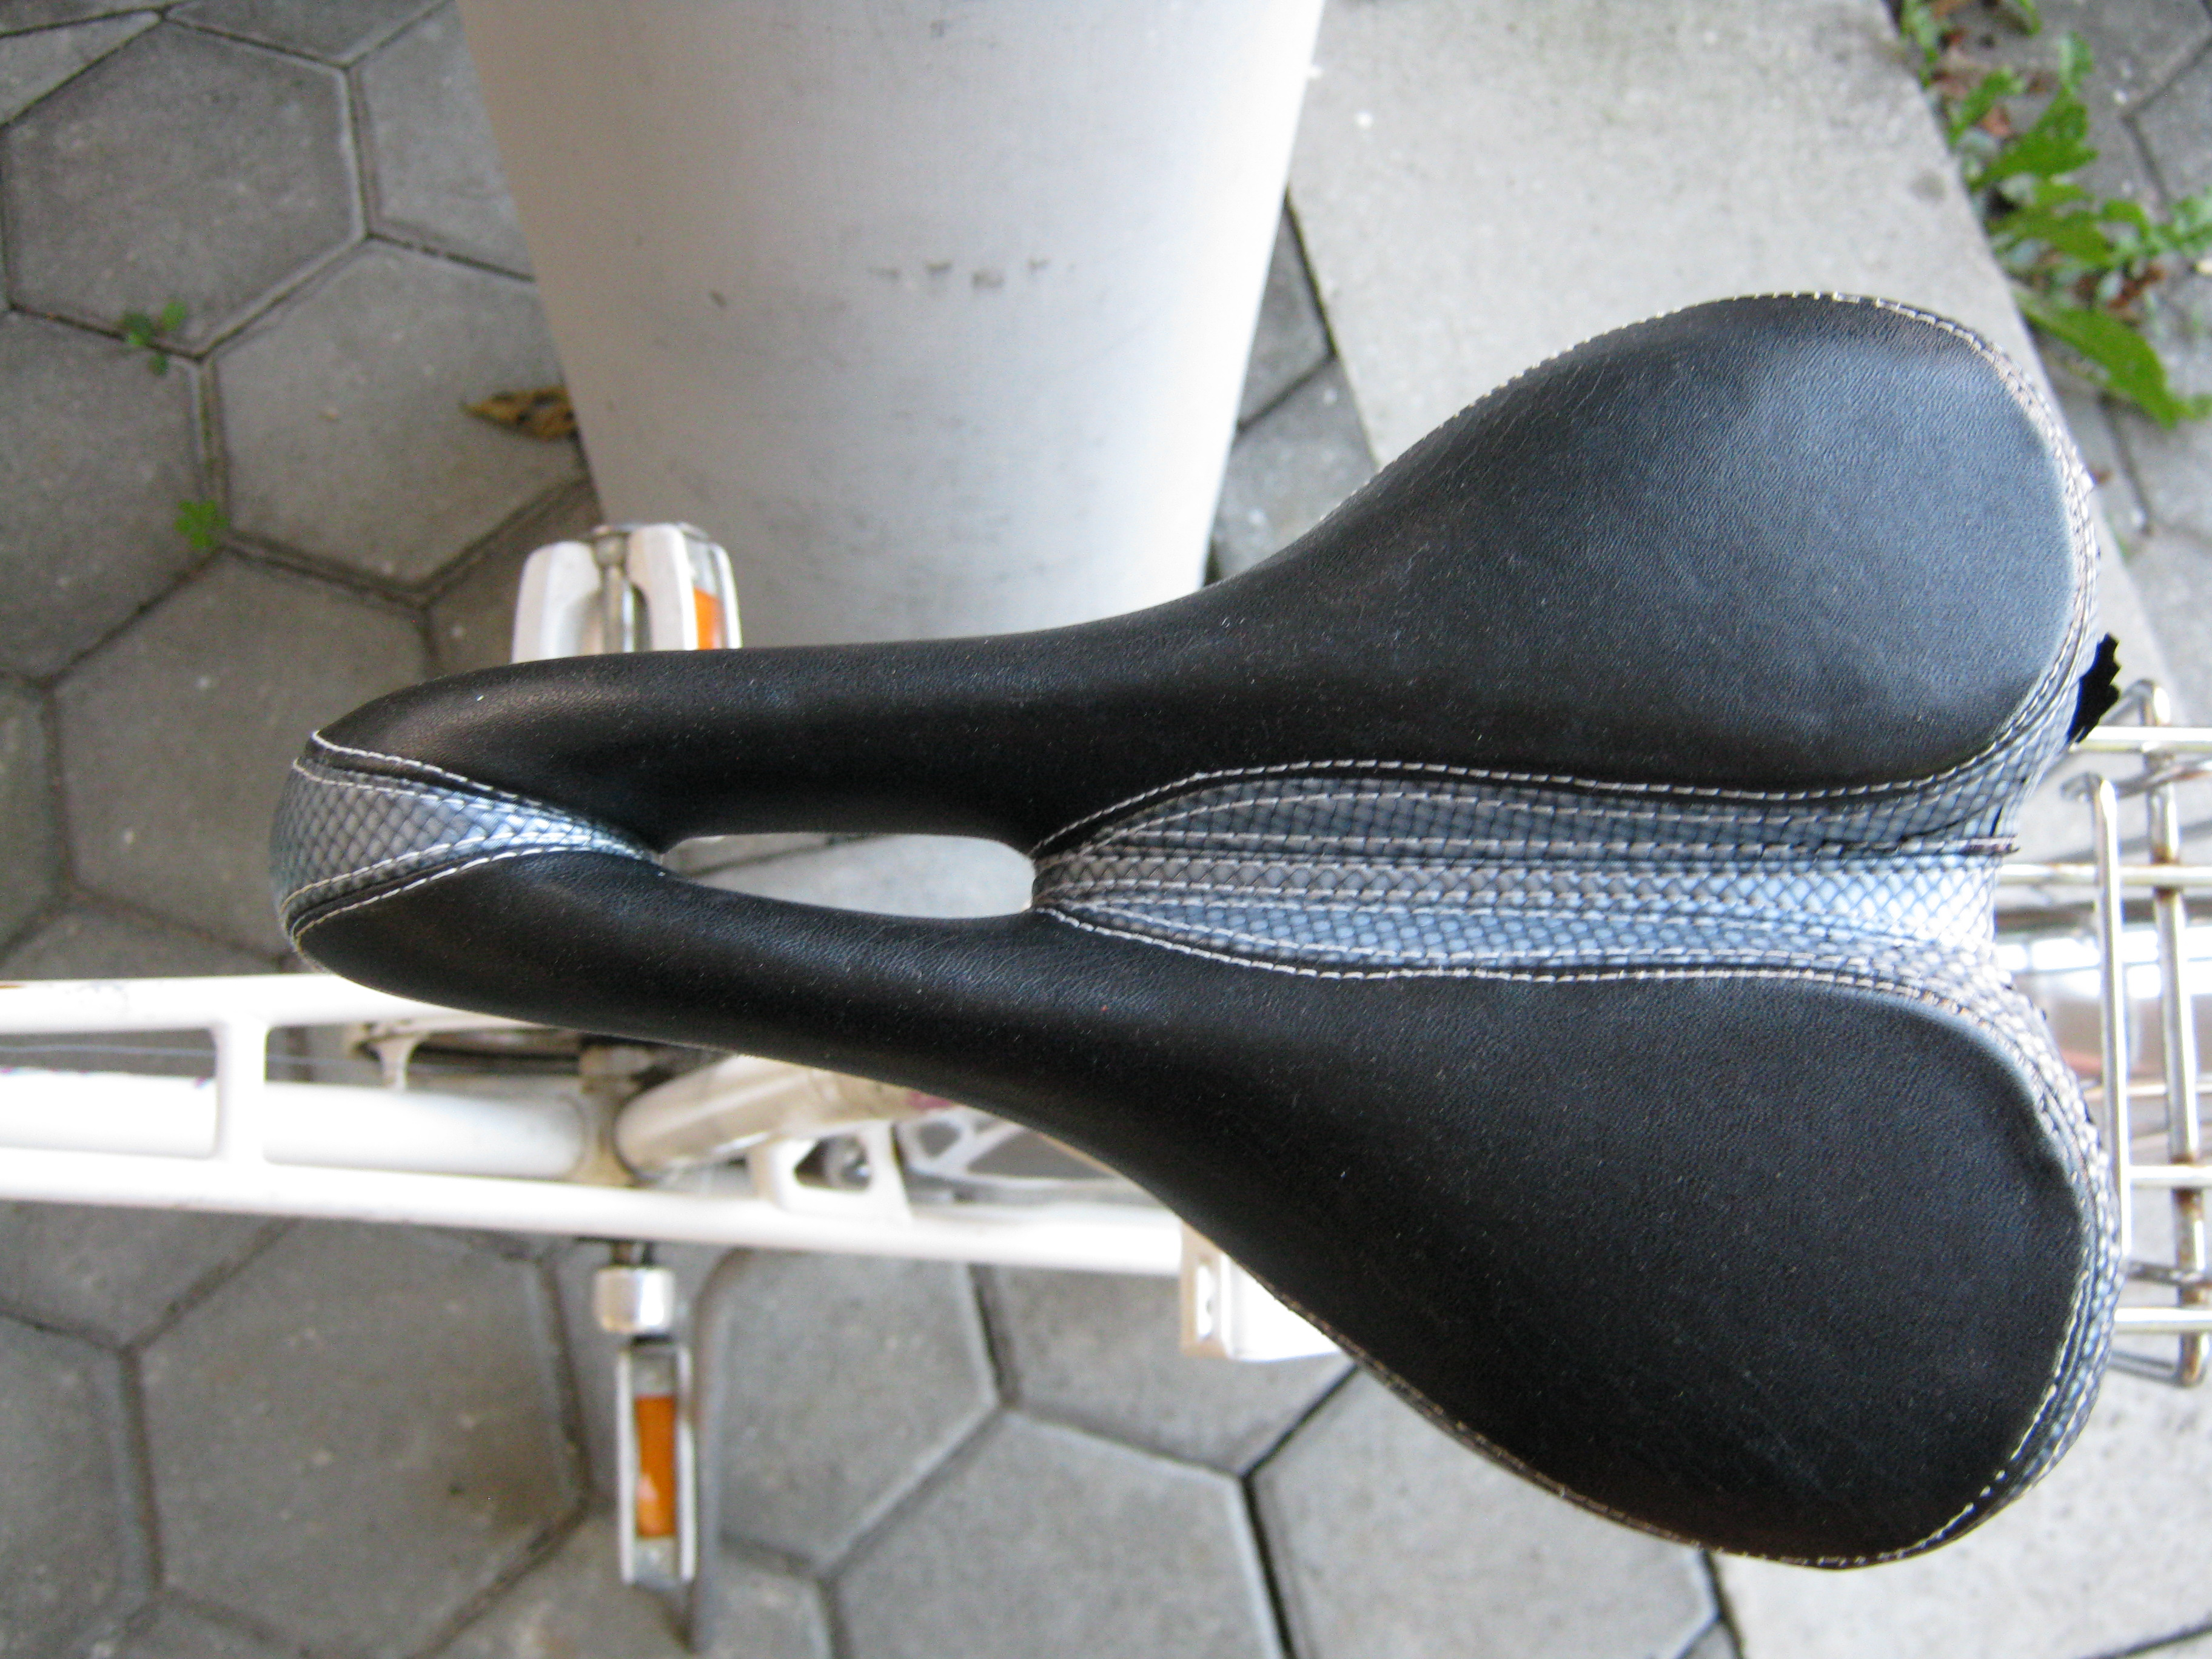 55 mb information description lochsattel für fahrrad source